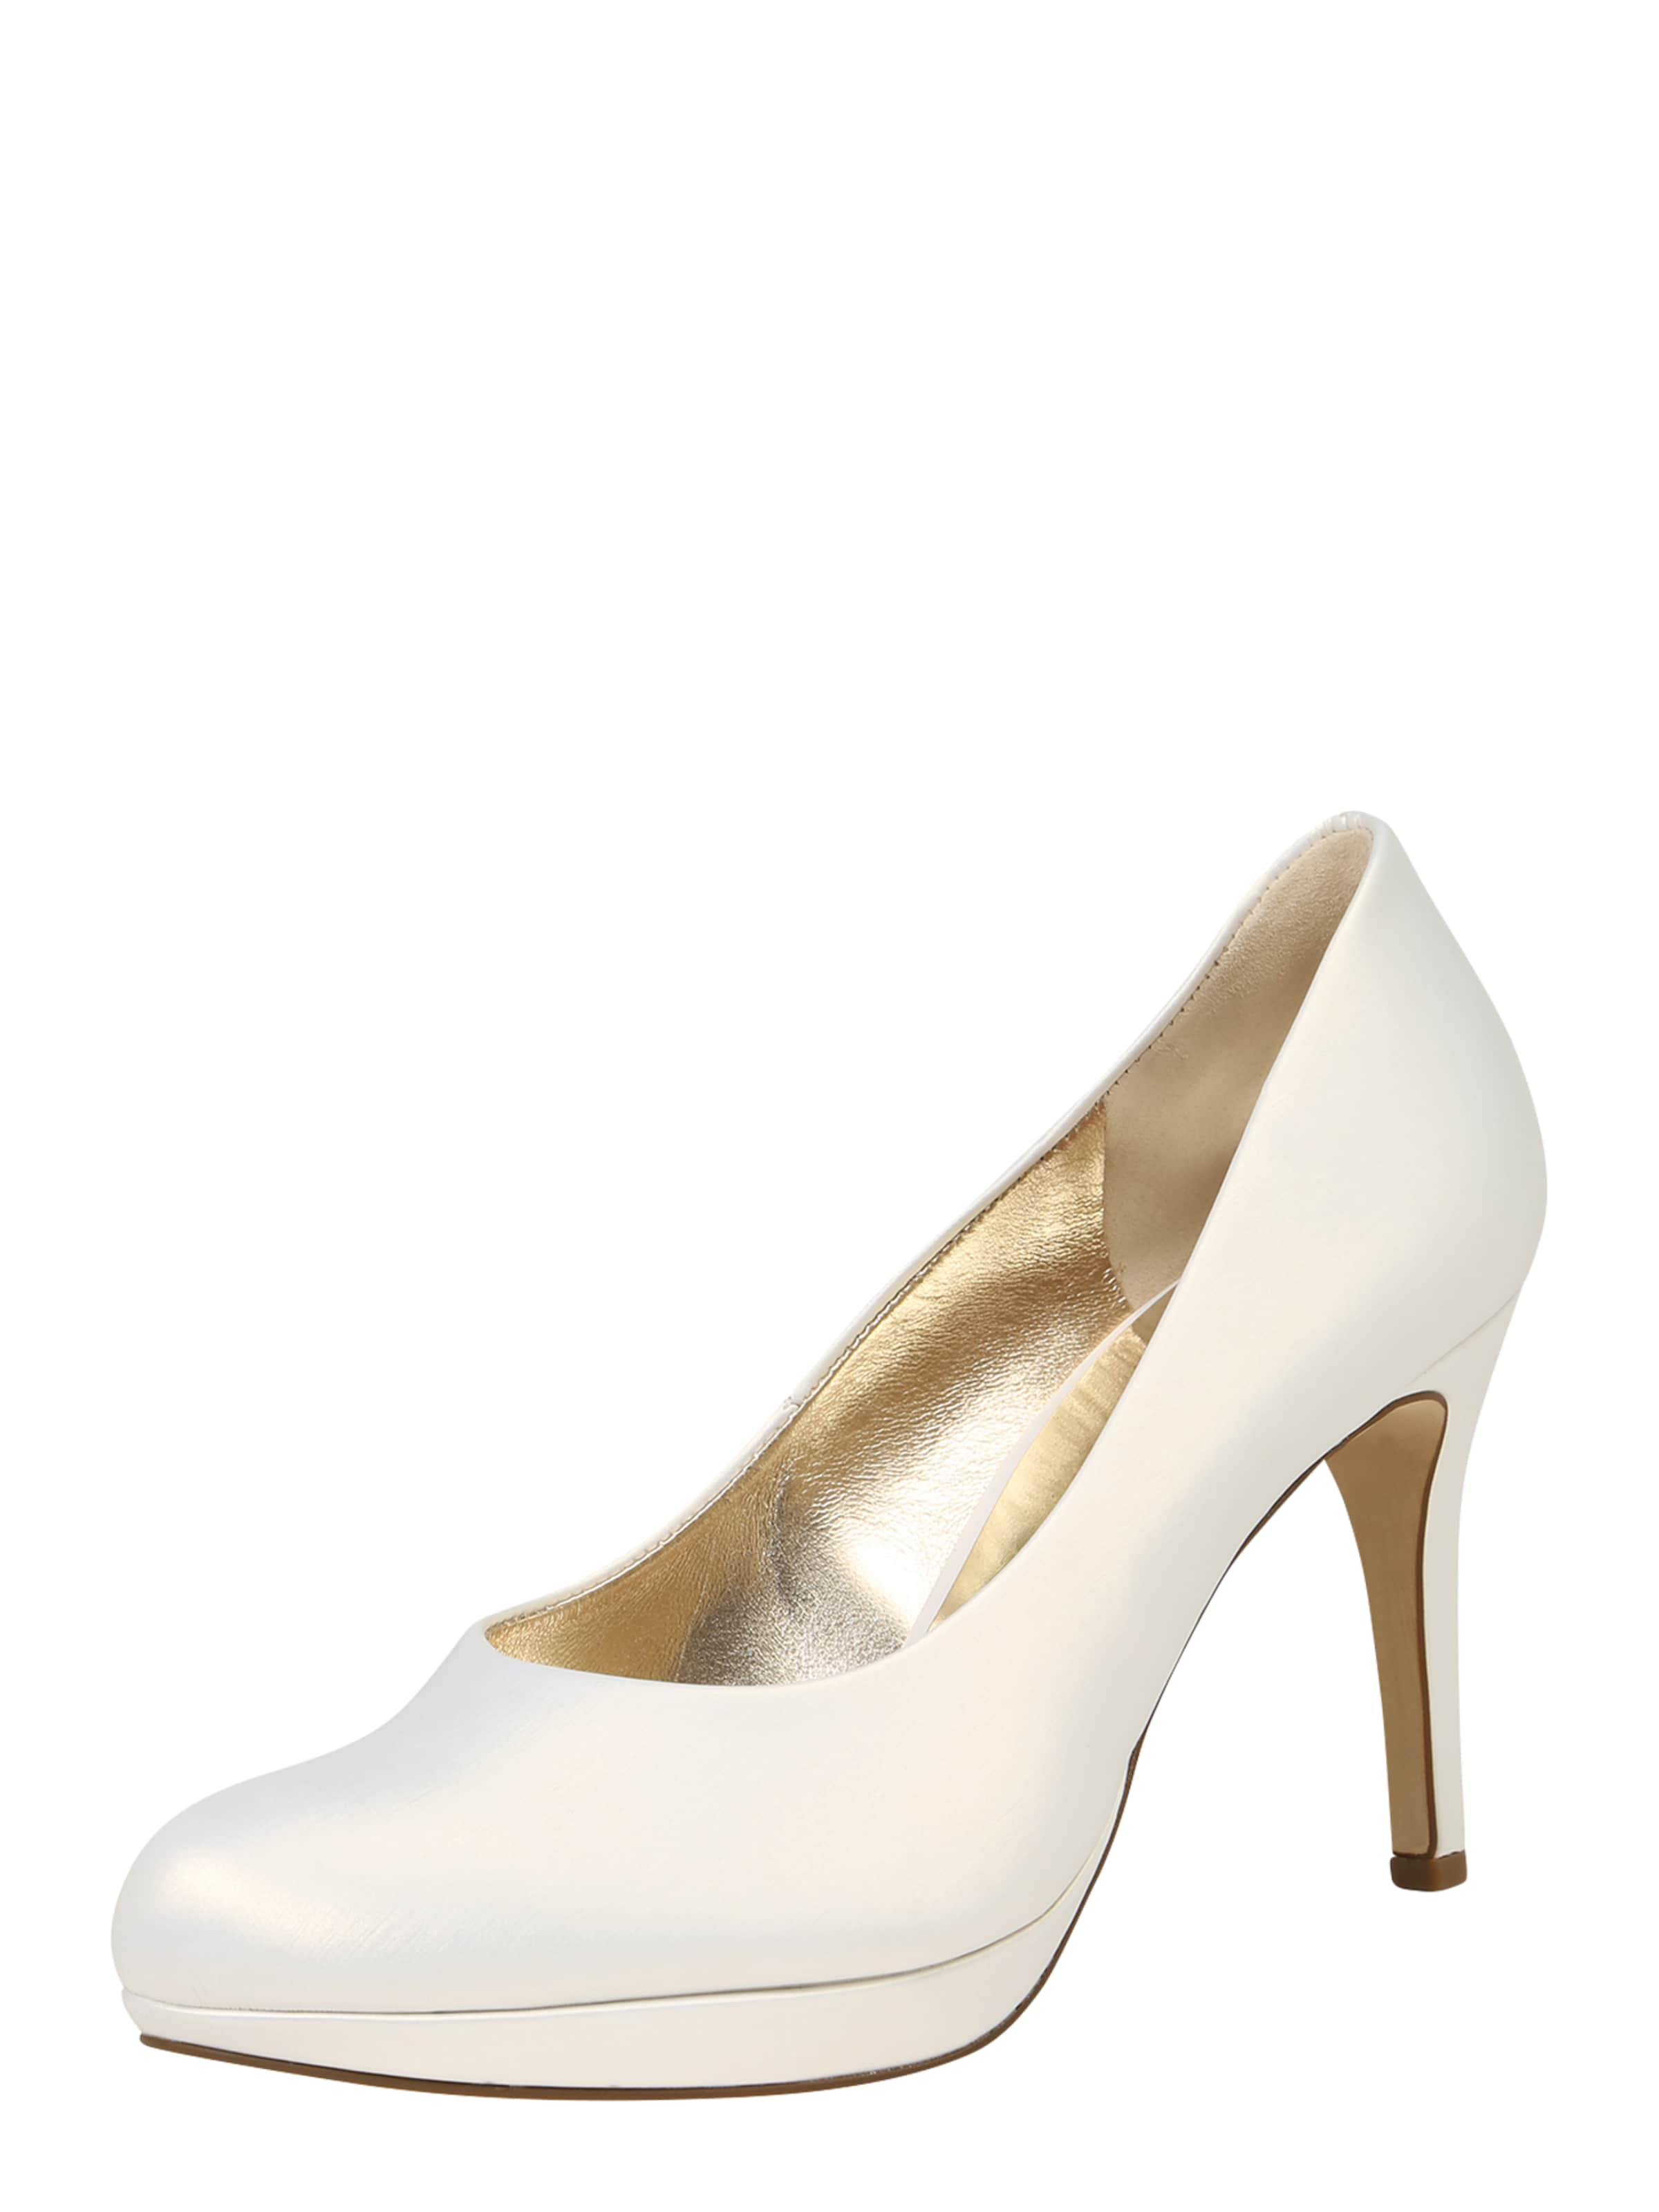 Högl Plateaupumps Günstige und langlebige Schuhe